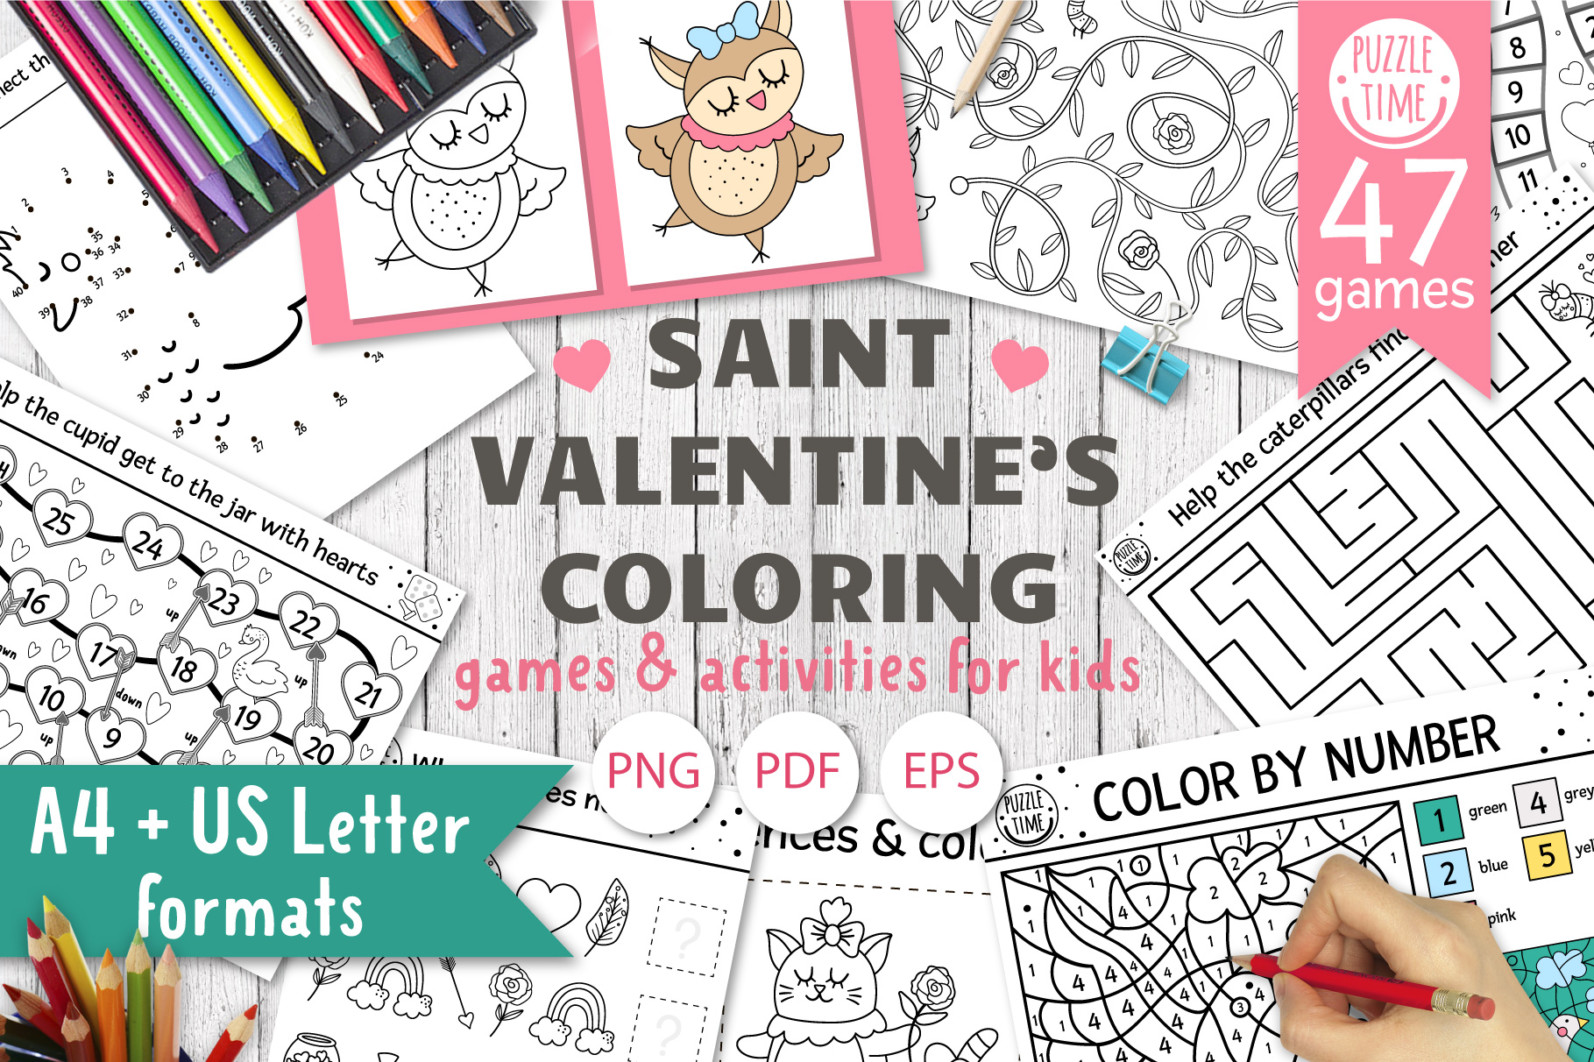 Saint Valentine's Coloring Games - 1 19 -